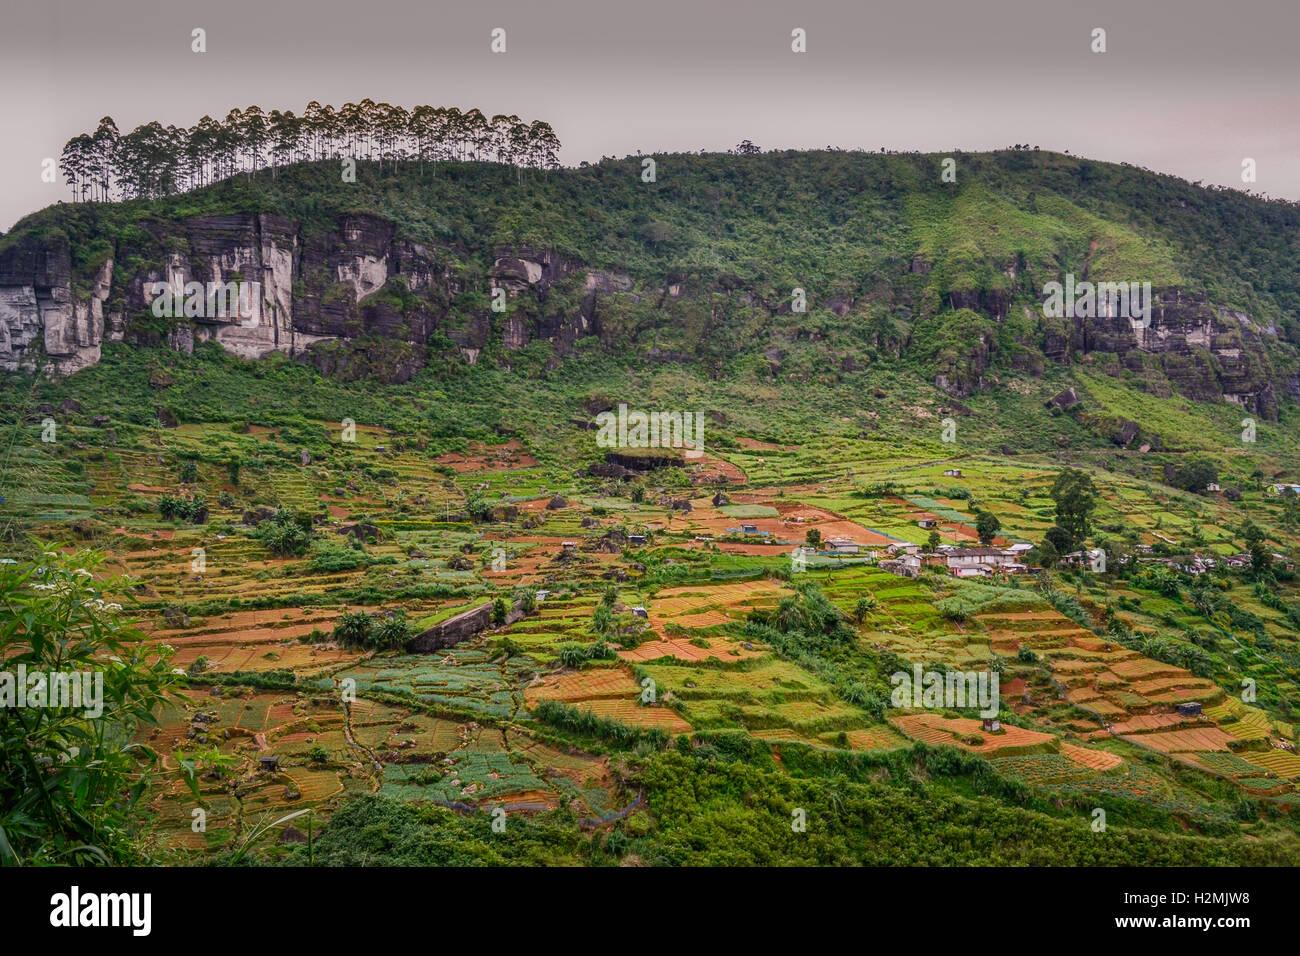 sri lanka, tea templations, rice fields, palm trees, nuwara eliya - Stock Image